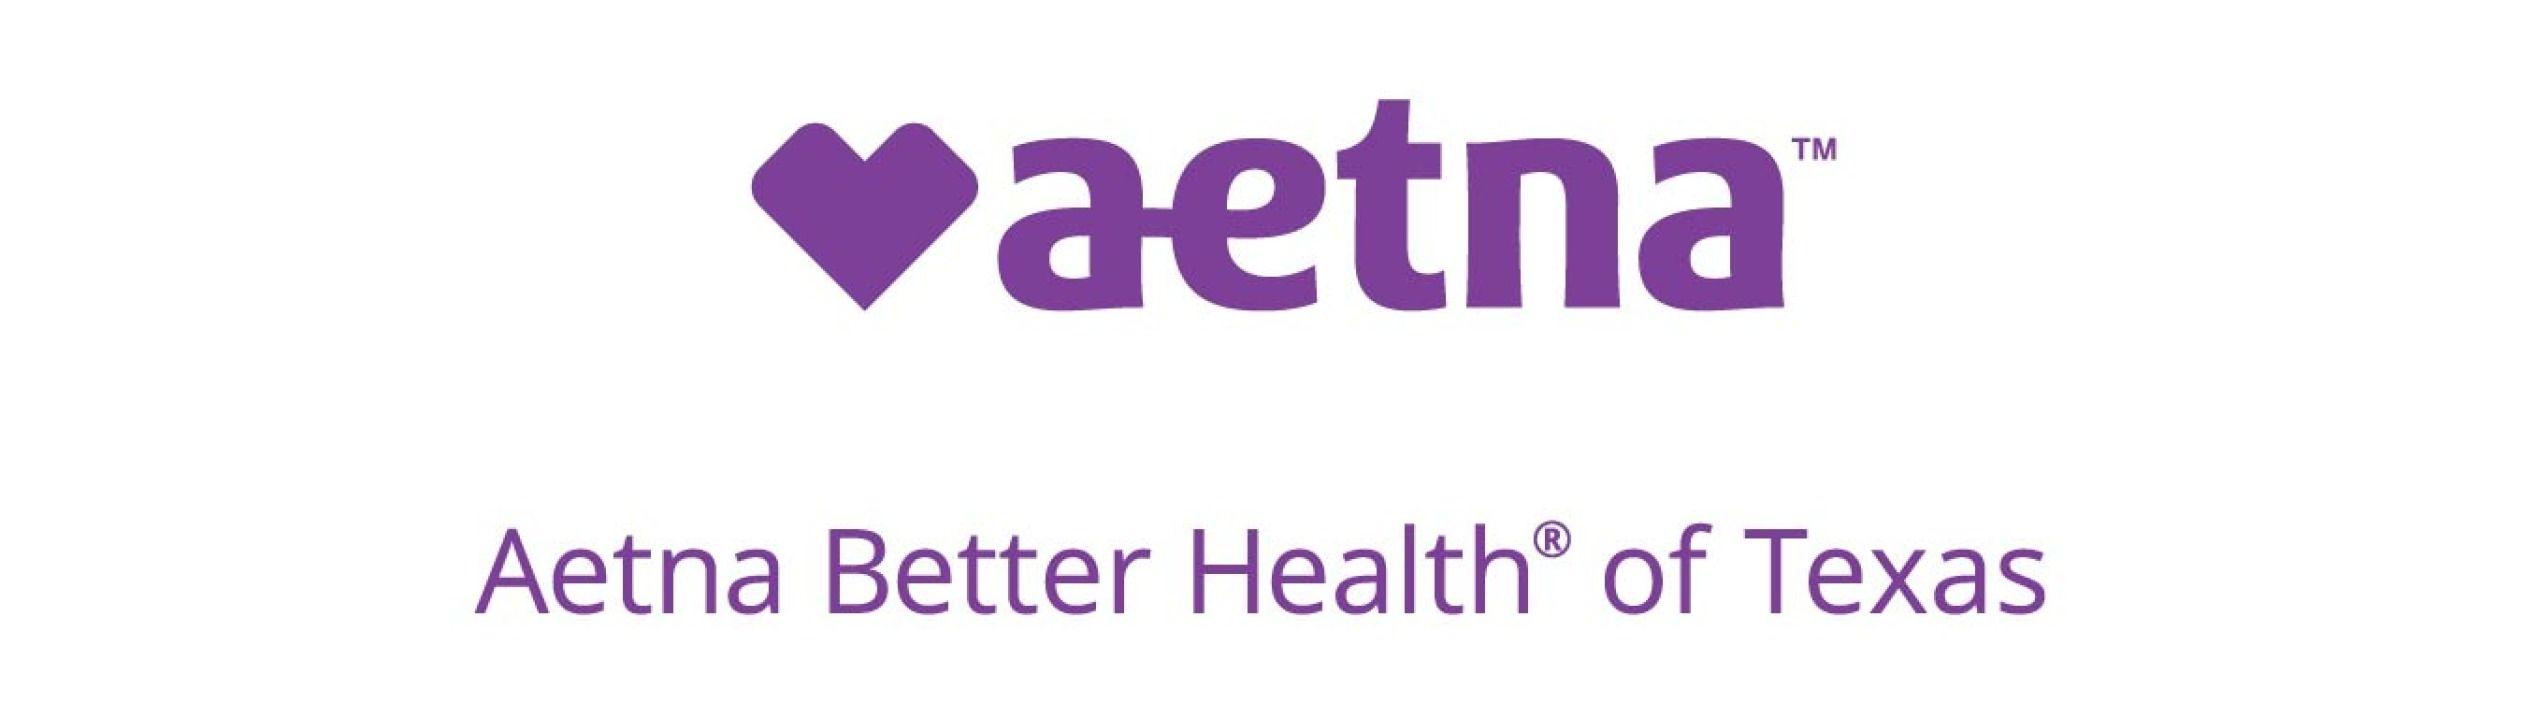 Aetna Better Health of Texas